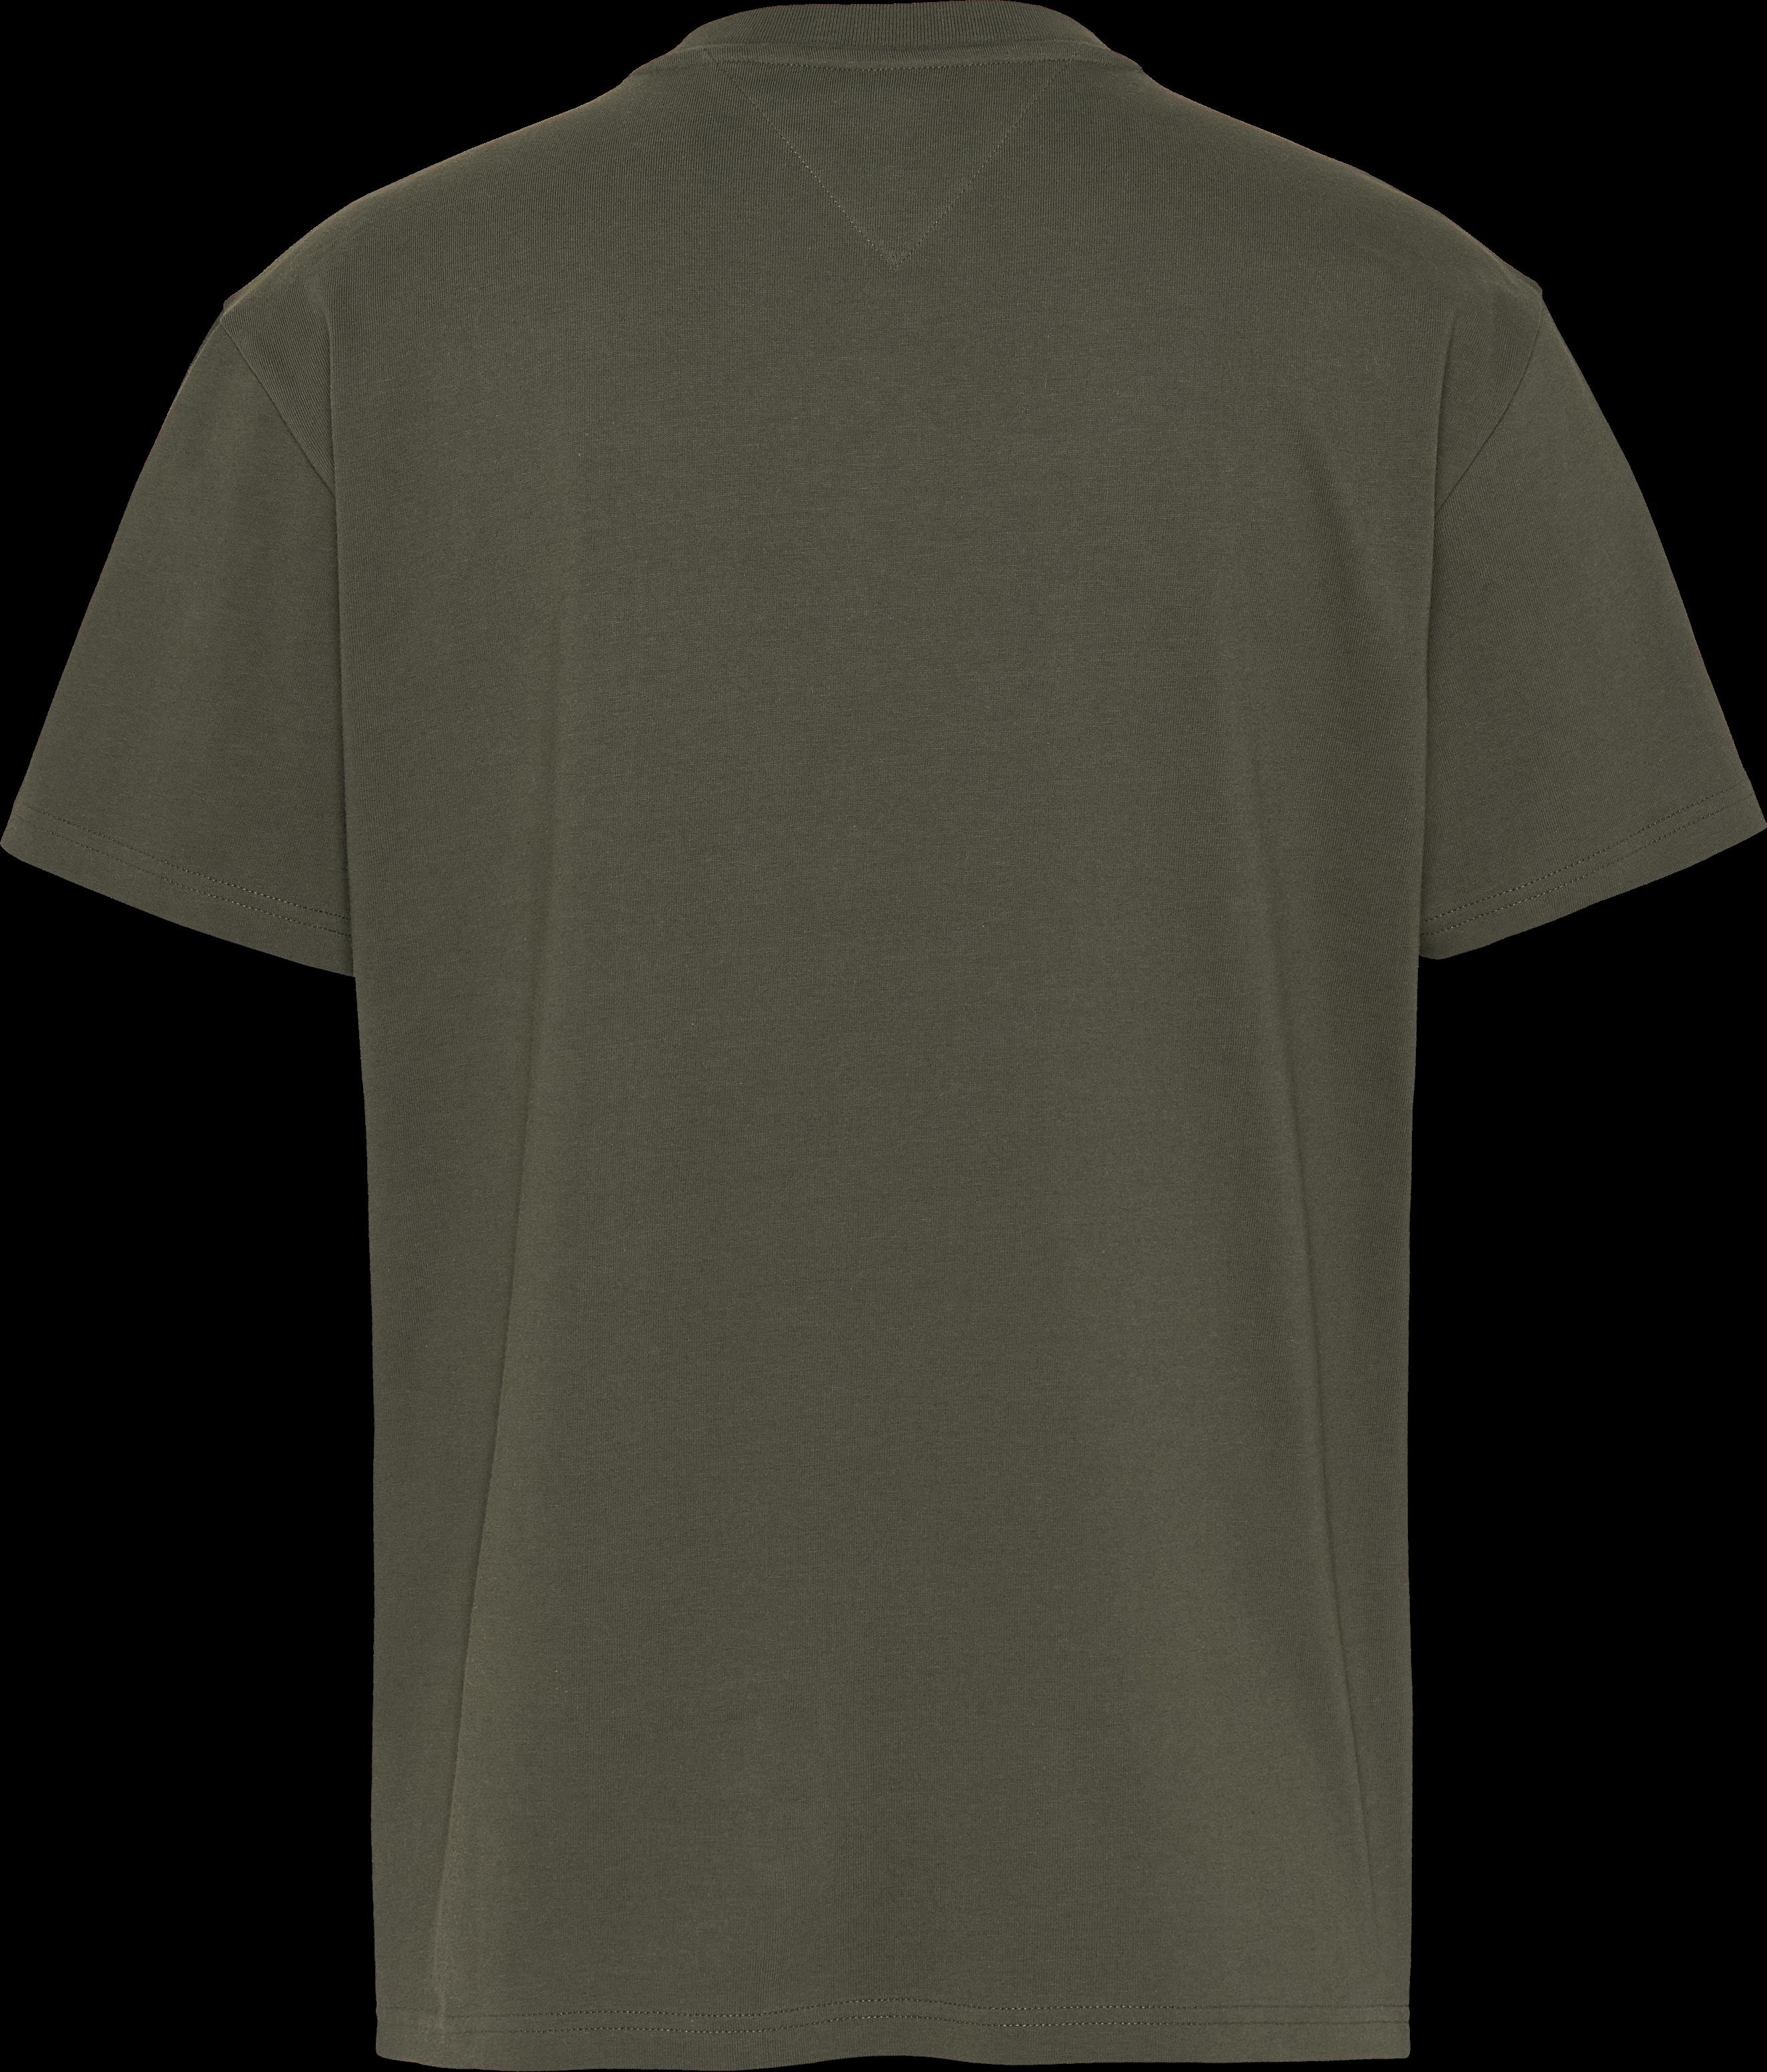 Hilfiger Denim Circle Logo T-shirt, Dark Olive, XXL